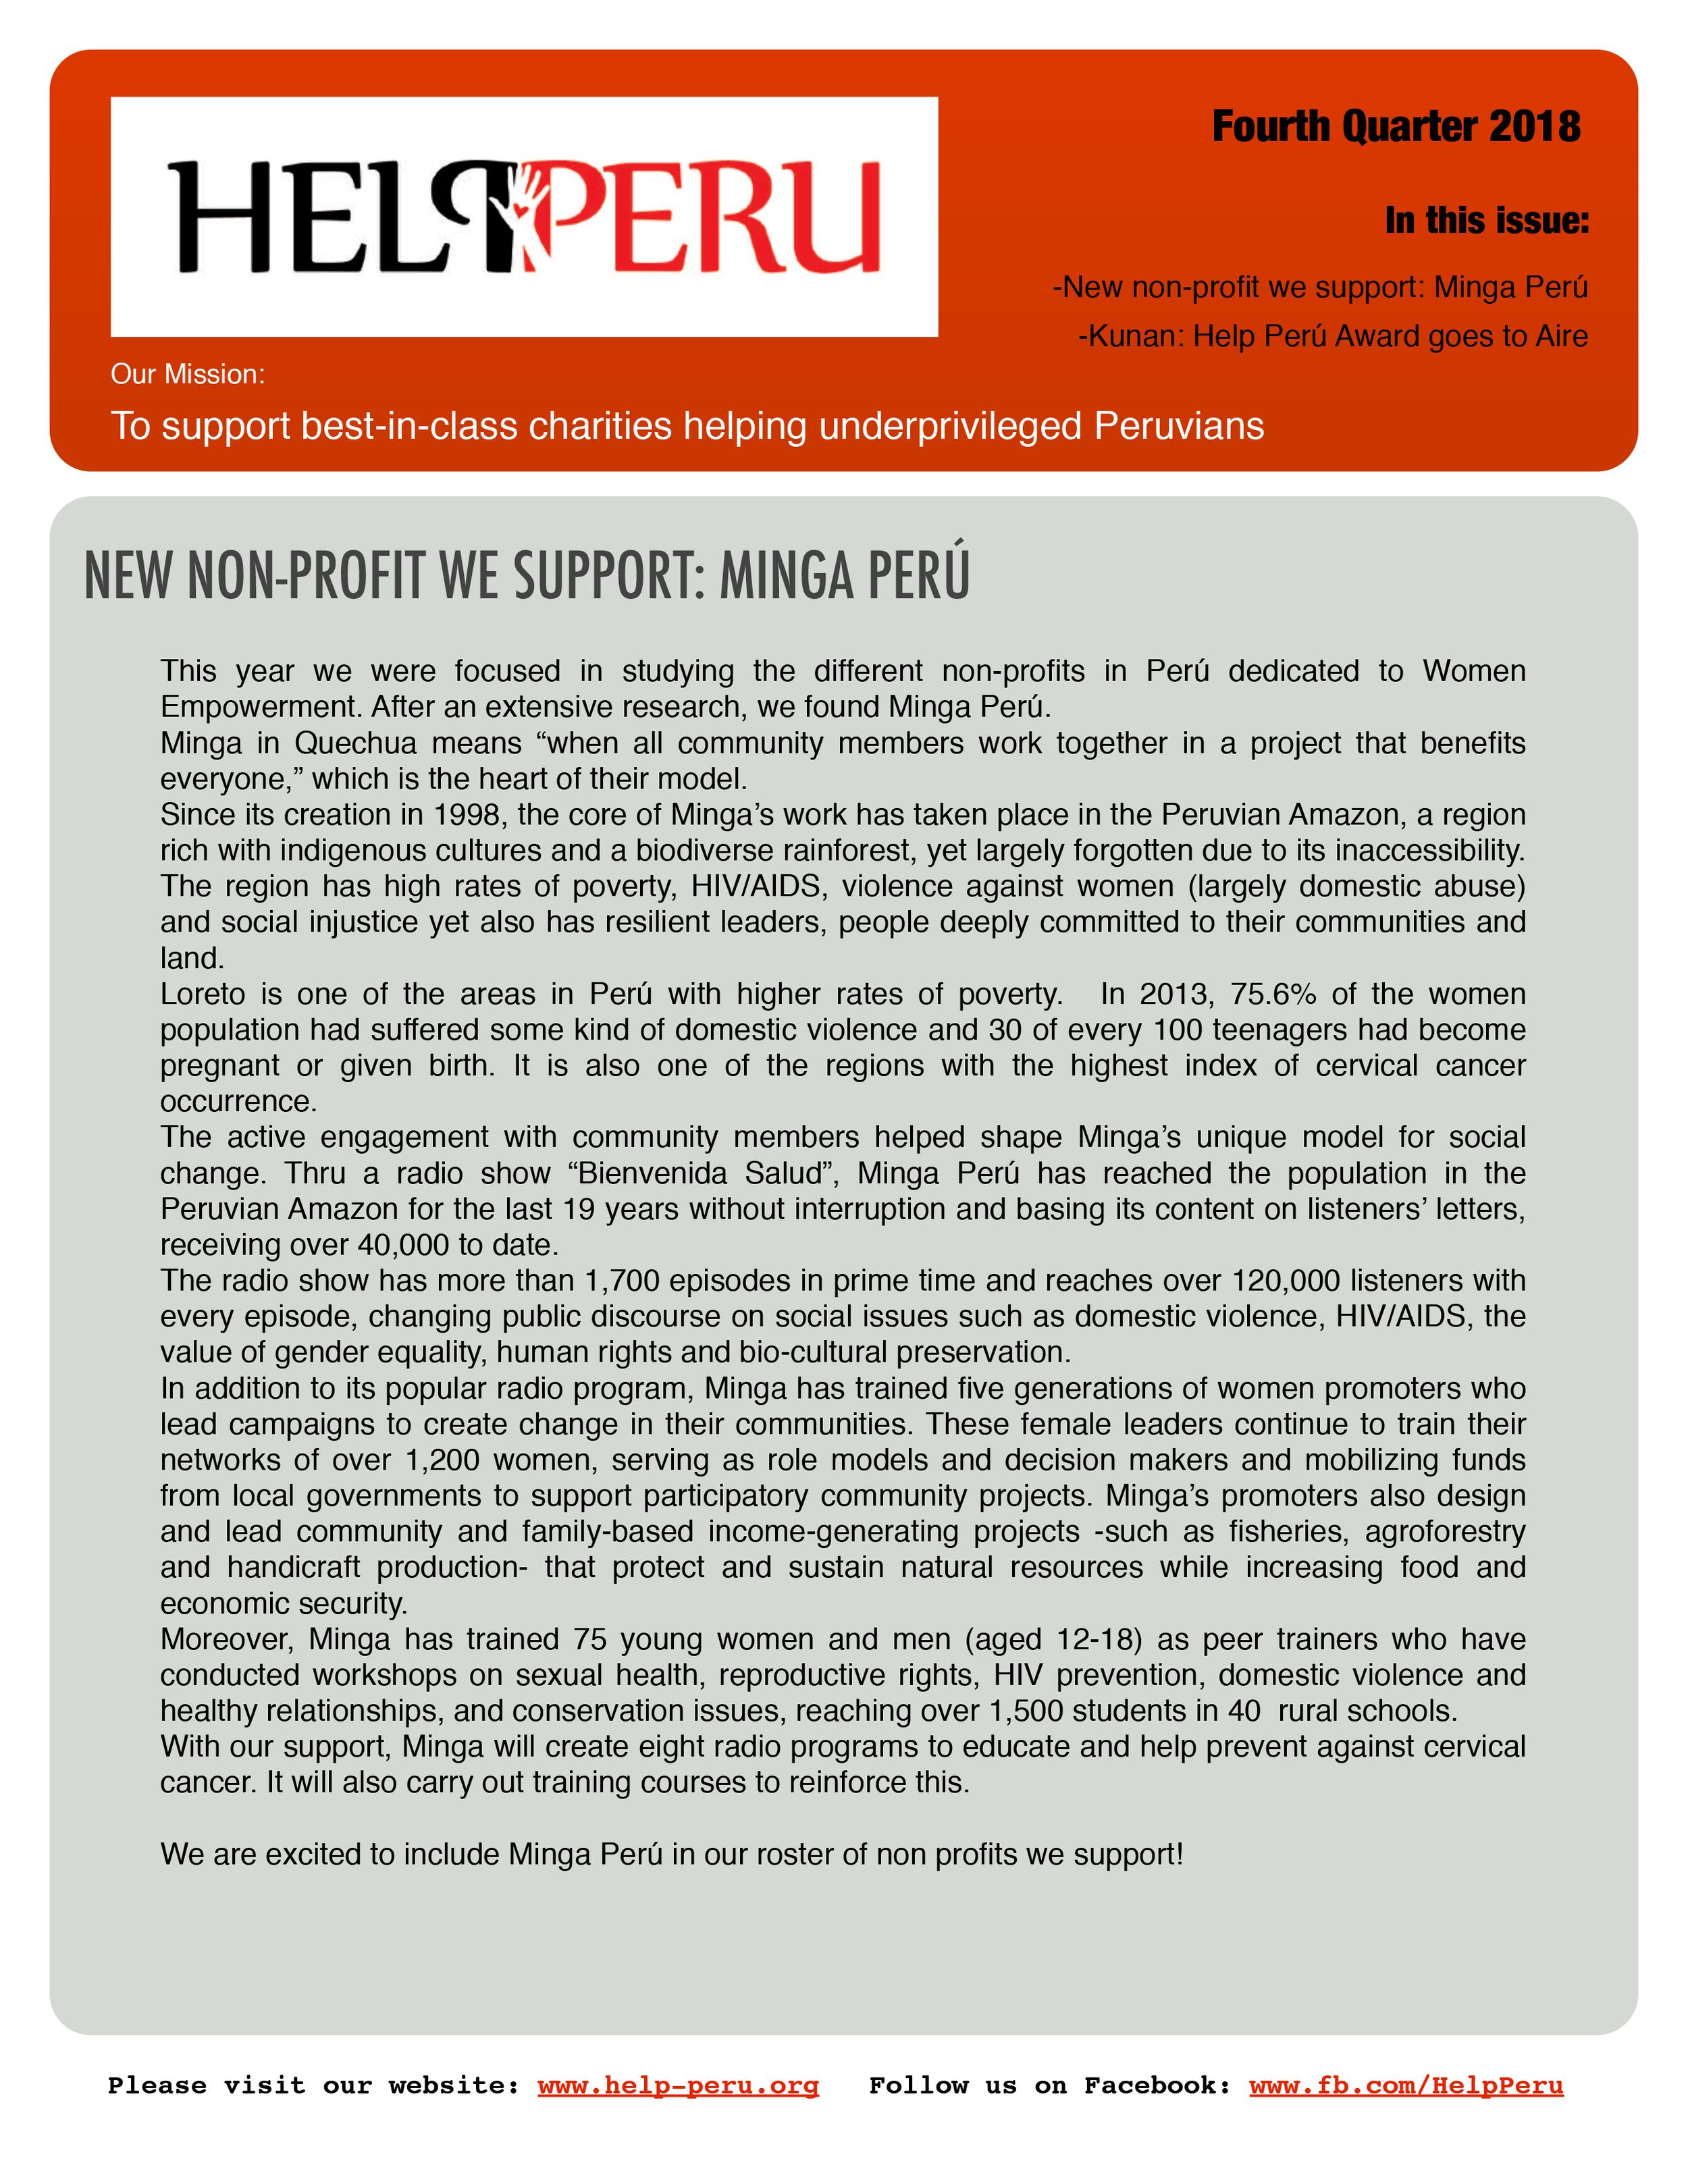 Help Peru Bulletin 4Q 2018